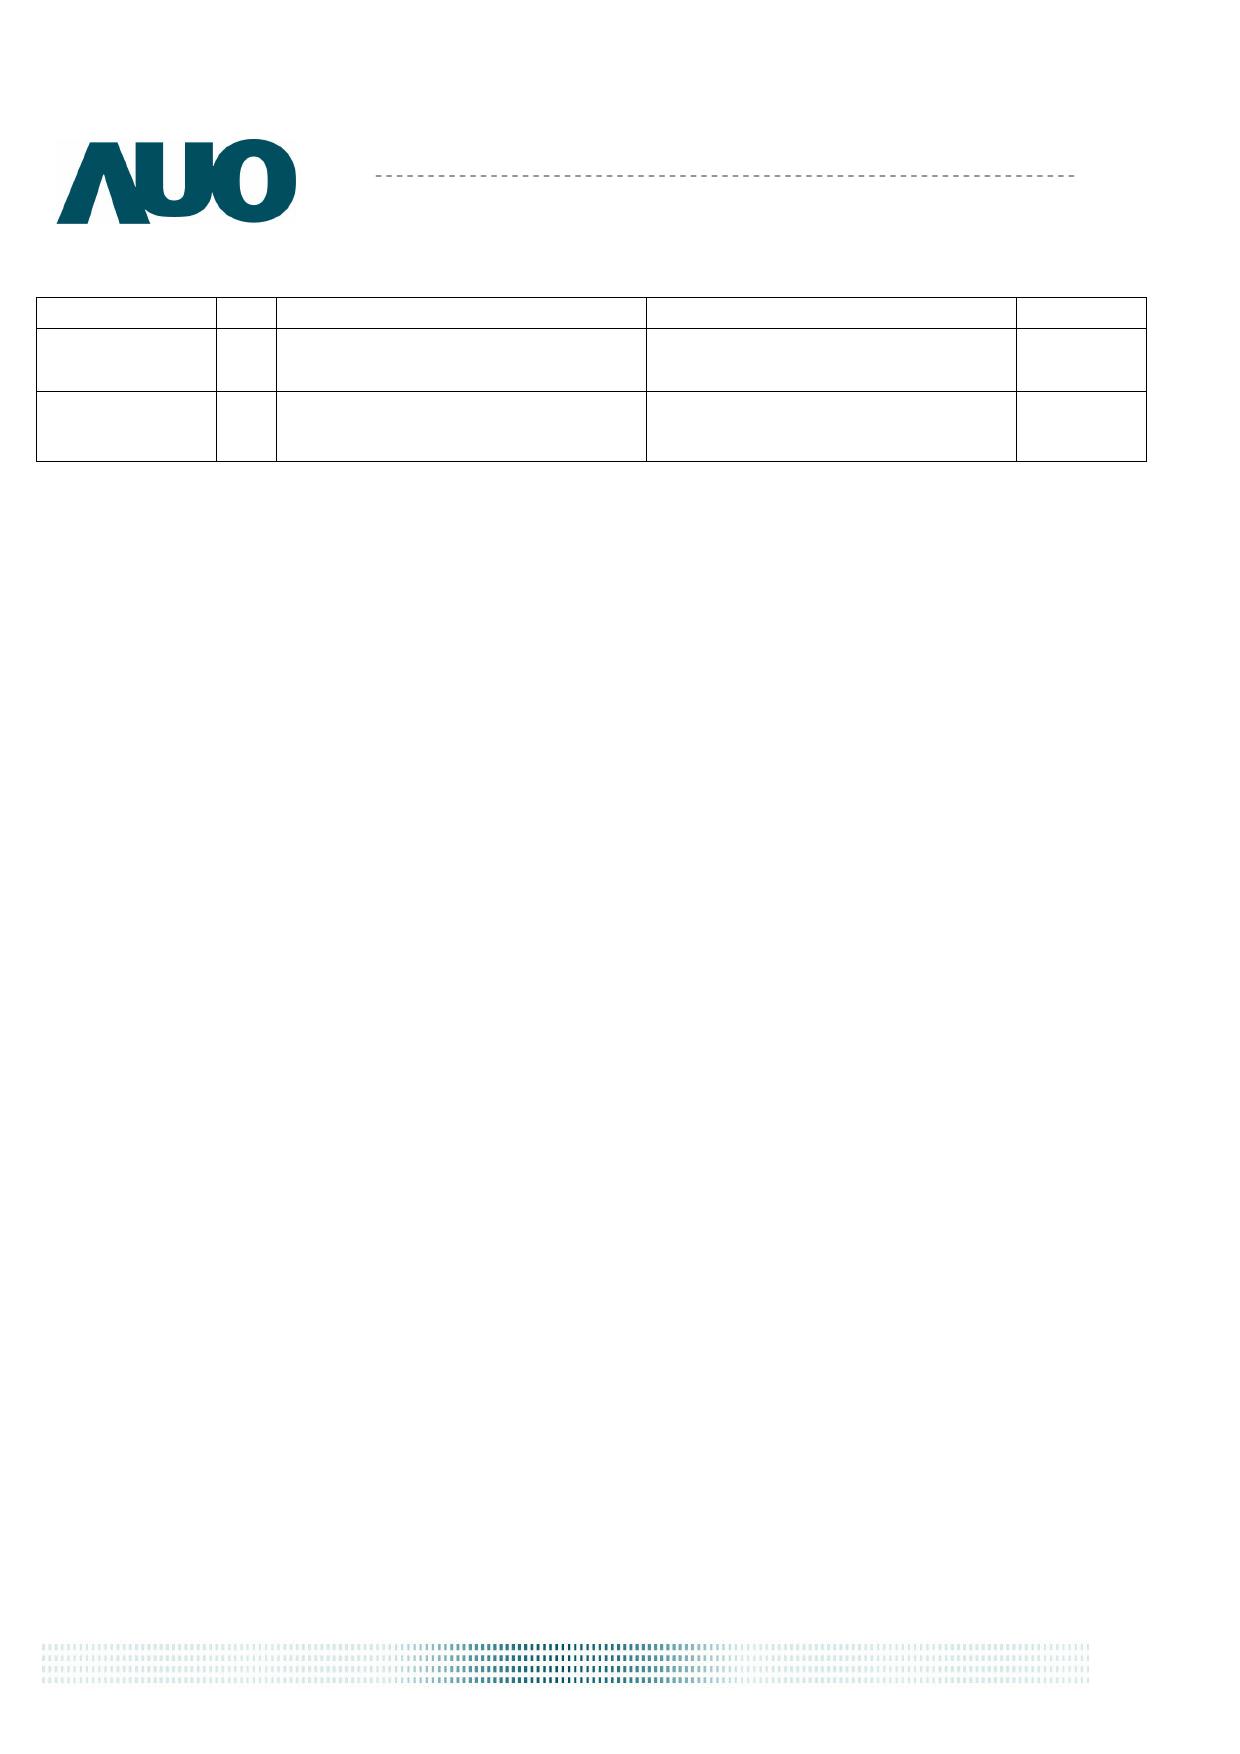 G057VTN01.0 Даташит, Описание, Даташиты